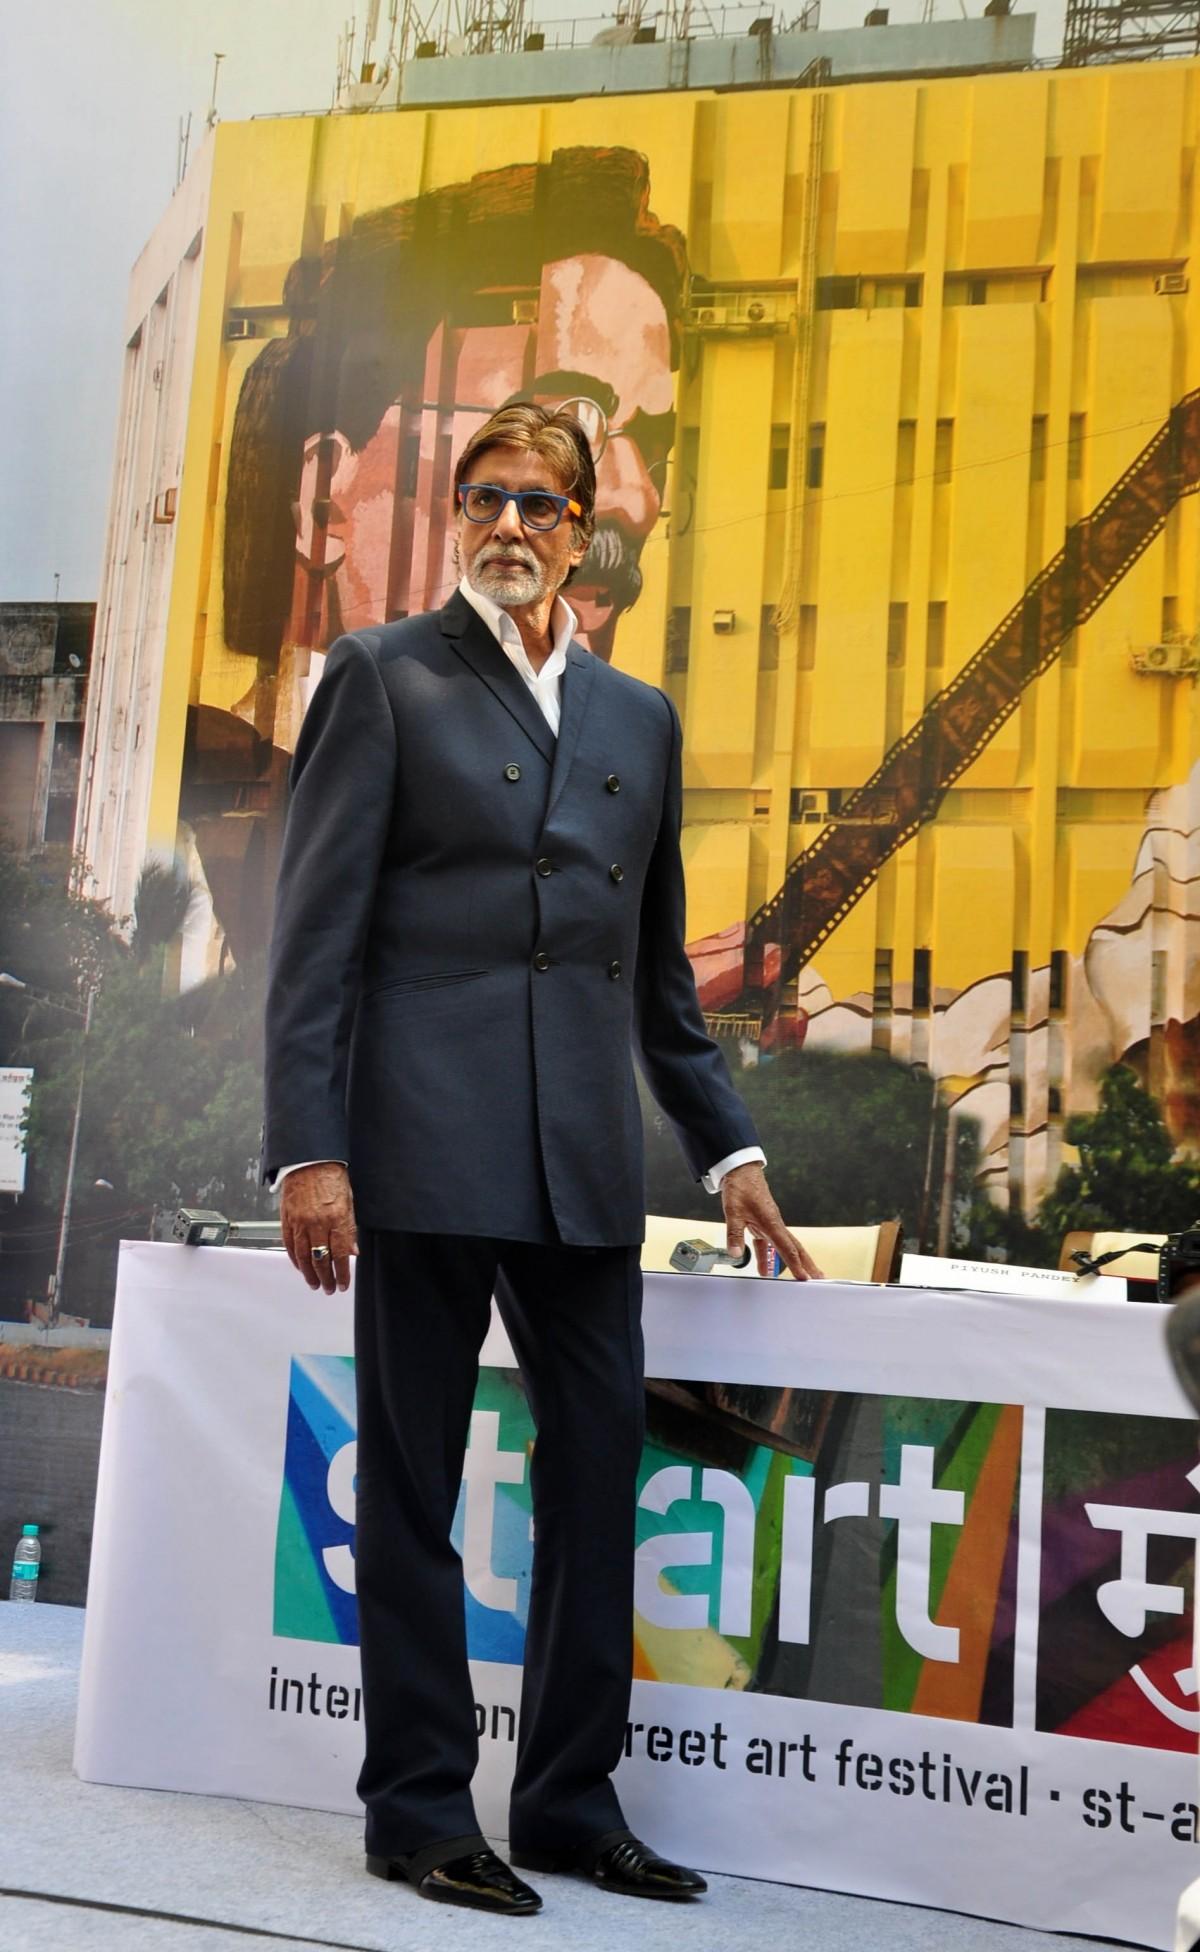 Amitabh Bachchan Unveils Gigantic Mural of  'Dada Saheb Phalke'